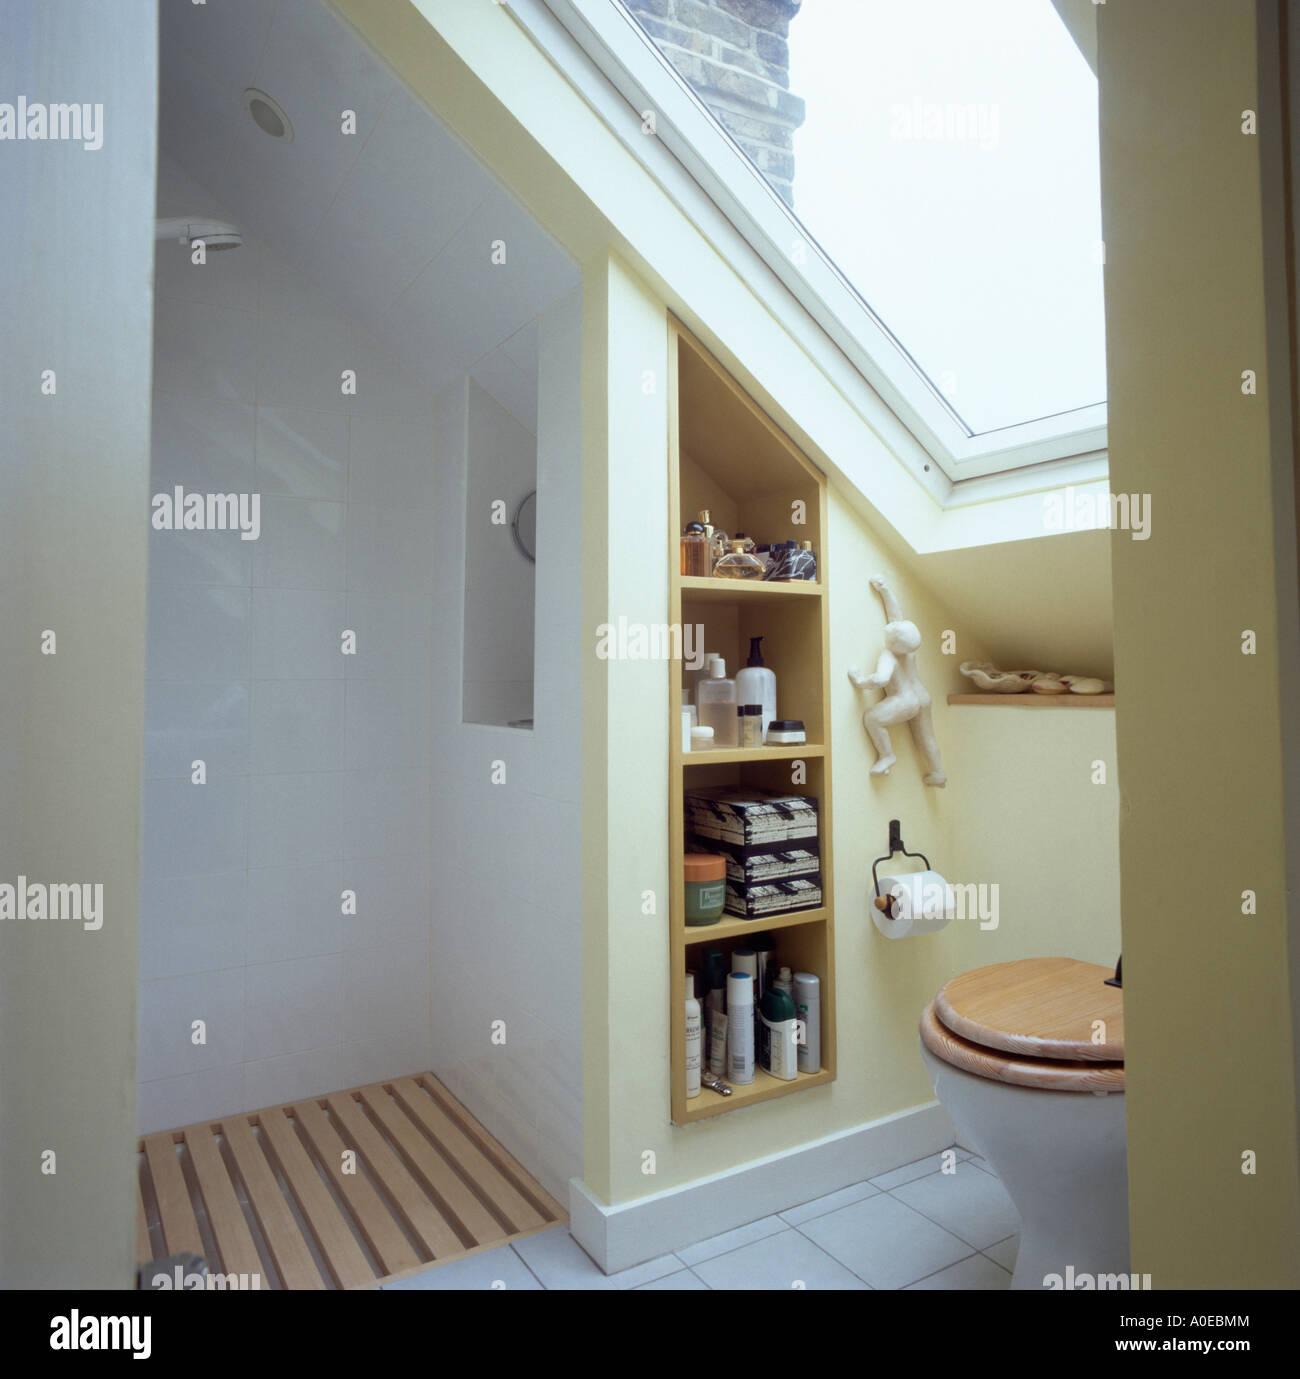 Shower And Shelves In Modern White Attic Bathroom With Wooden Bathmat